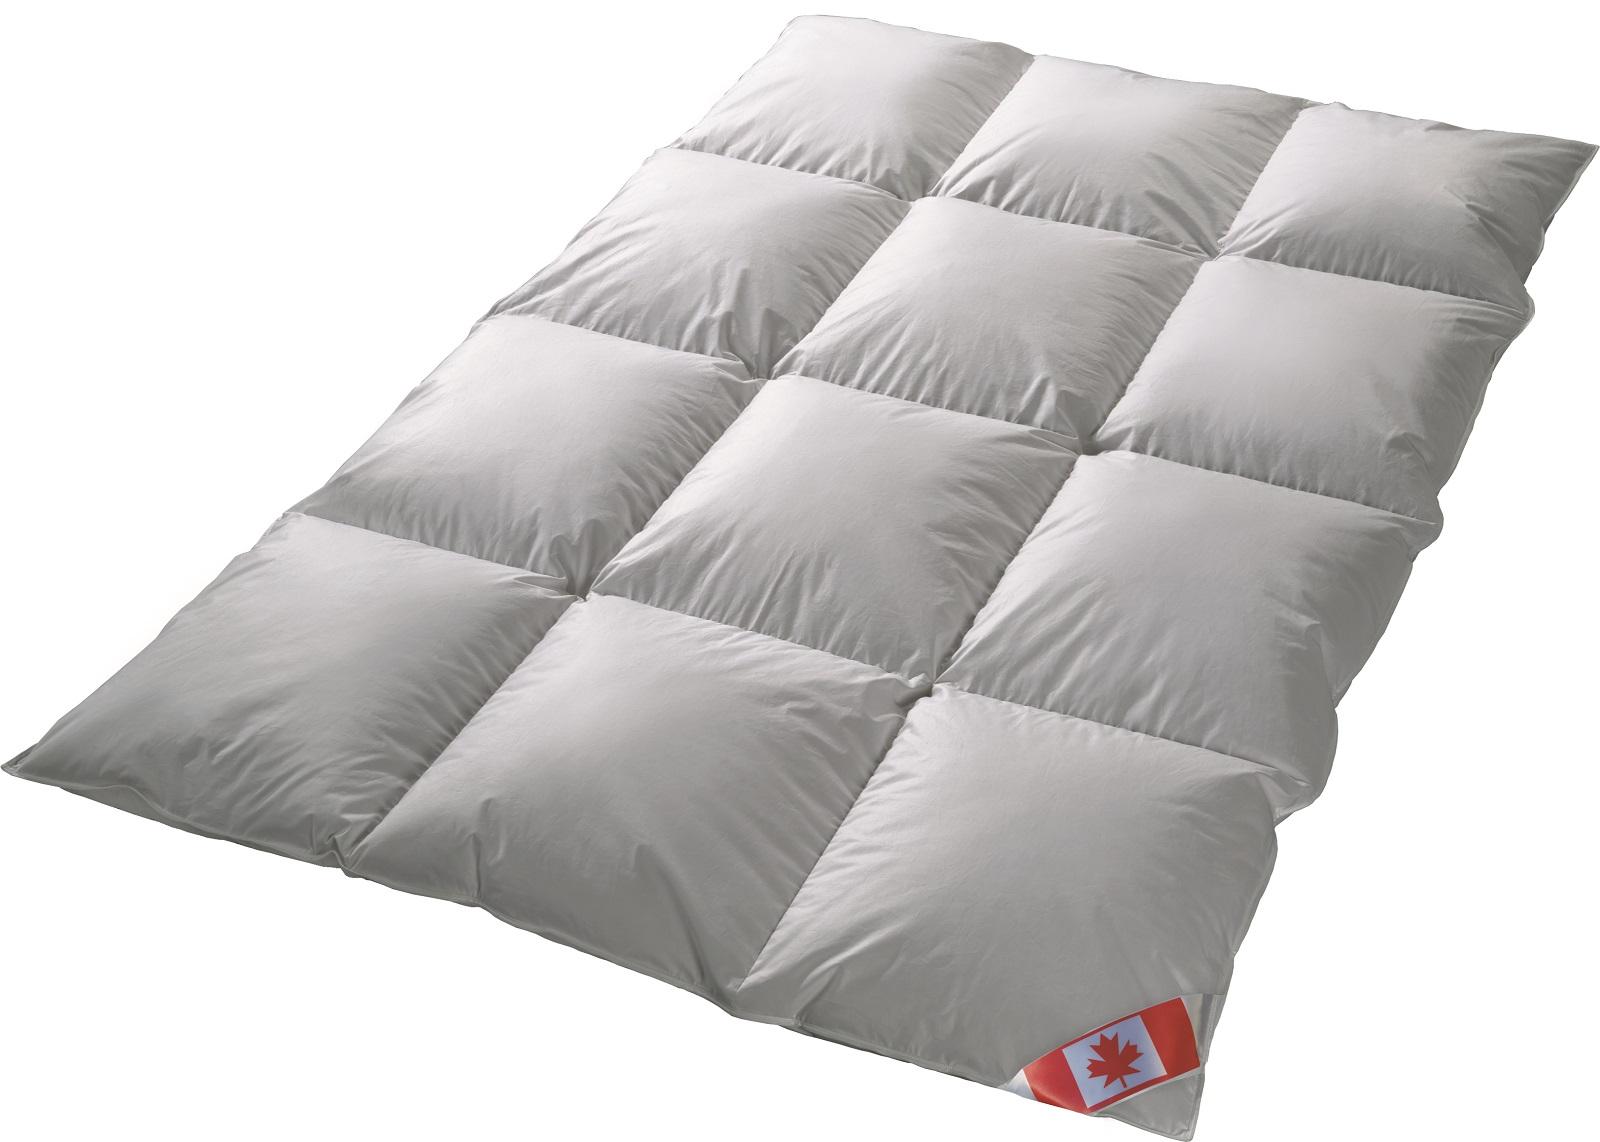 Canada Kassetten Daunendecke EXTRA warm Winter 100% Daune 135x200 cm R5